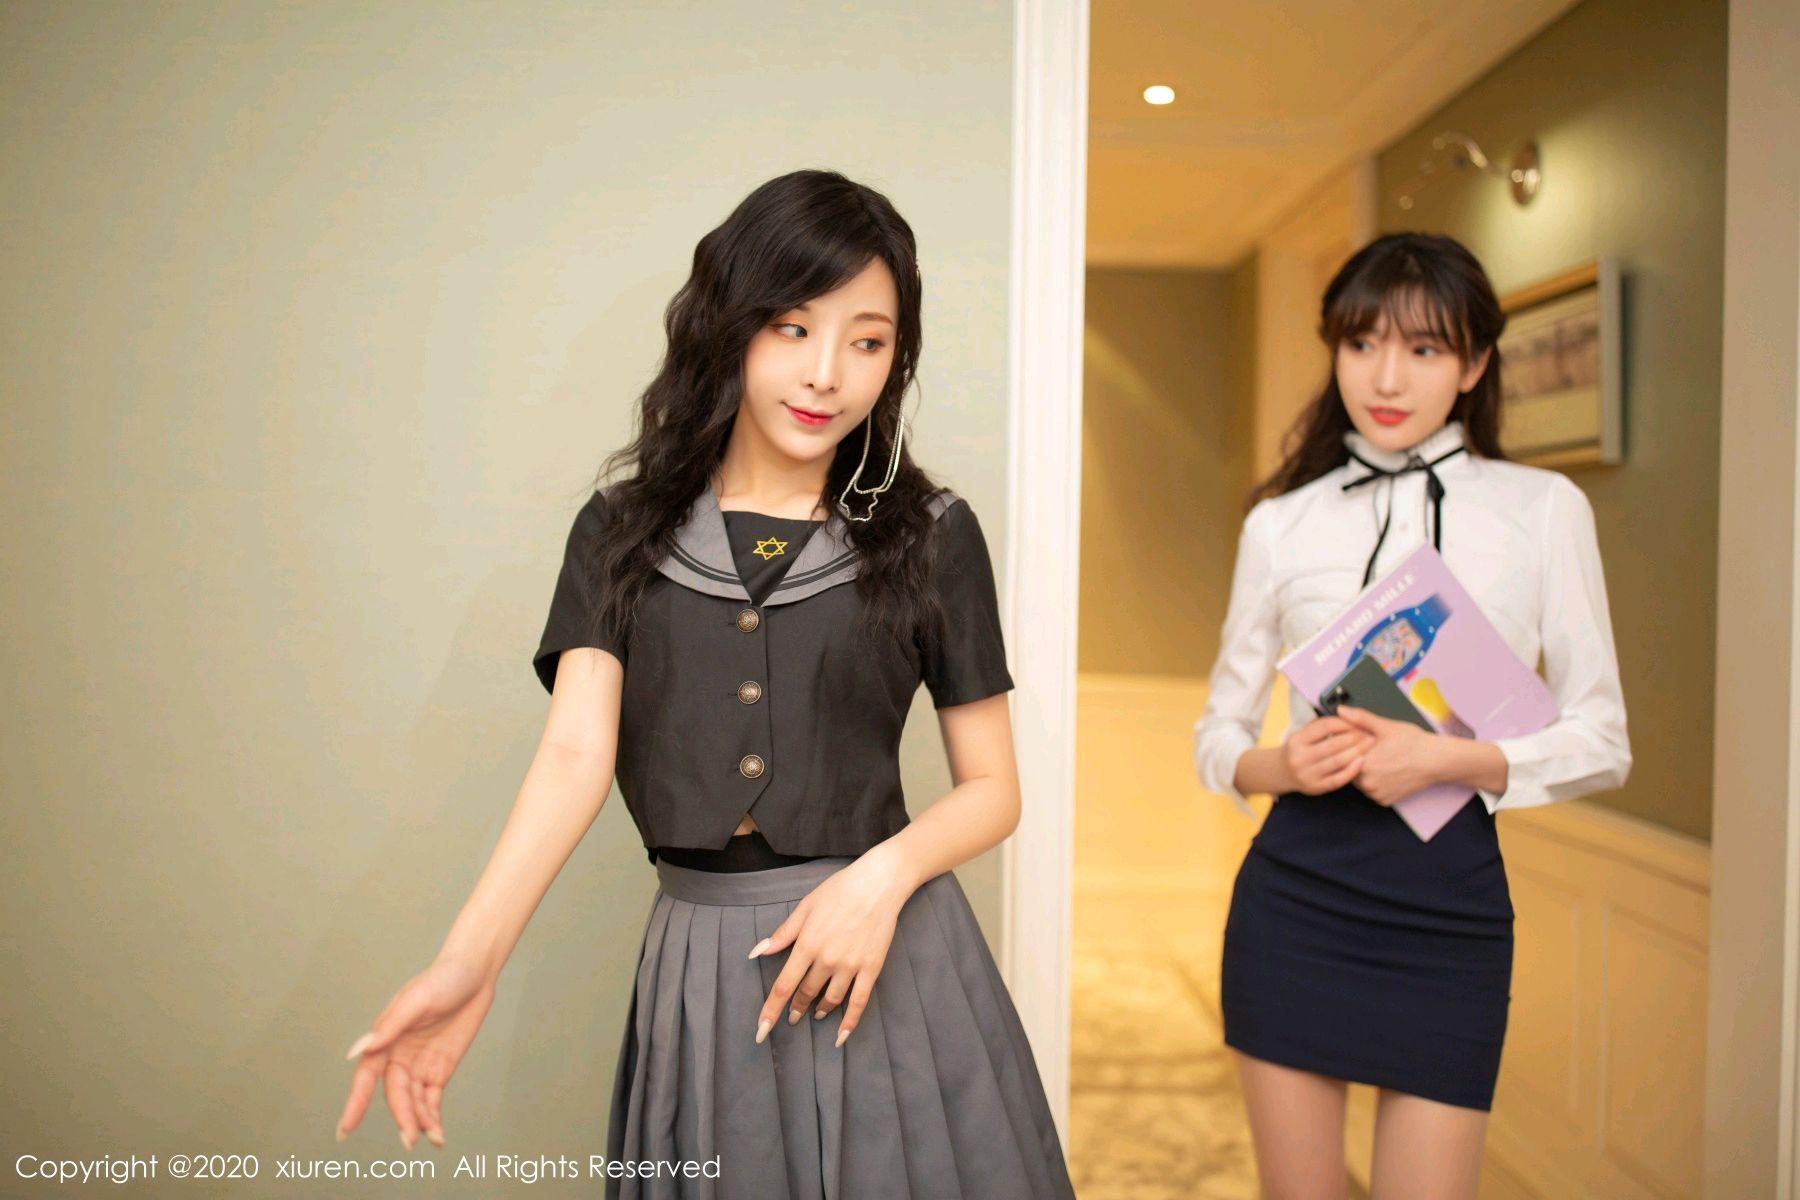 [XiuRen] Vol.2626 Secrets in mobile phones 5P, Chen Xiao Miao, Lu Xuan Xuan, School Uniform, Sisters, Xiuren